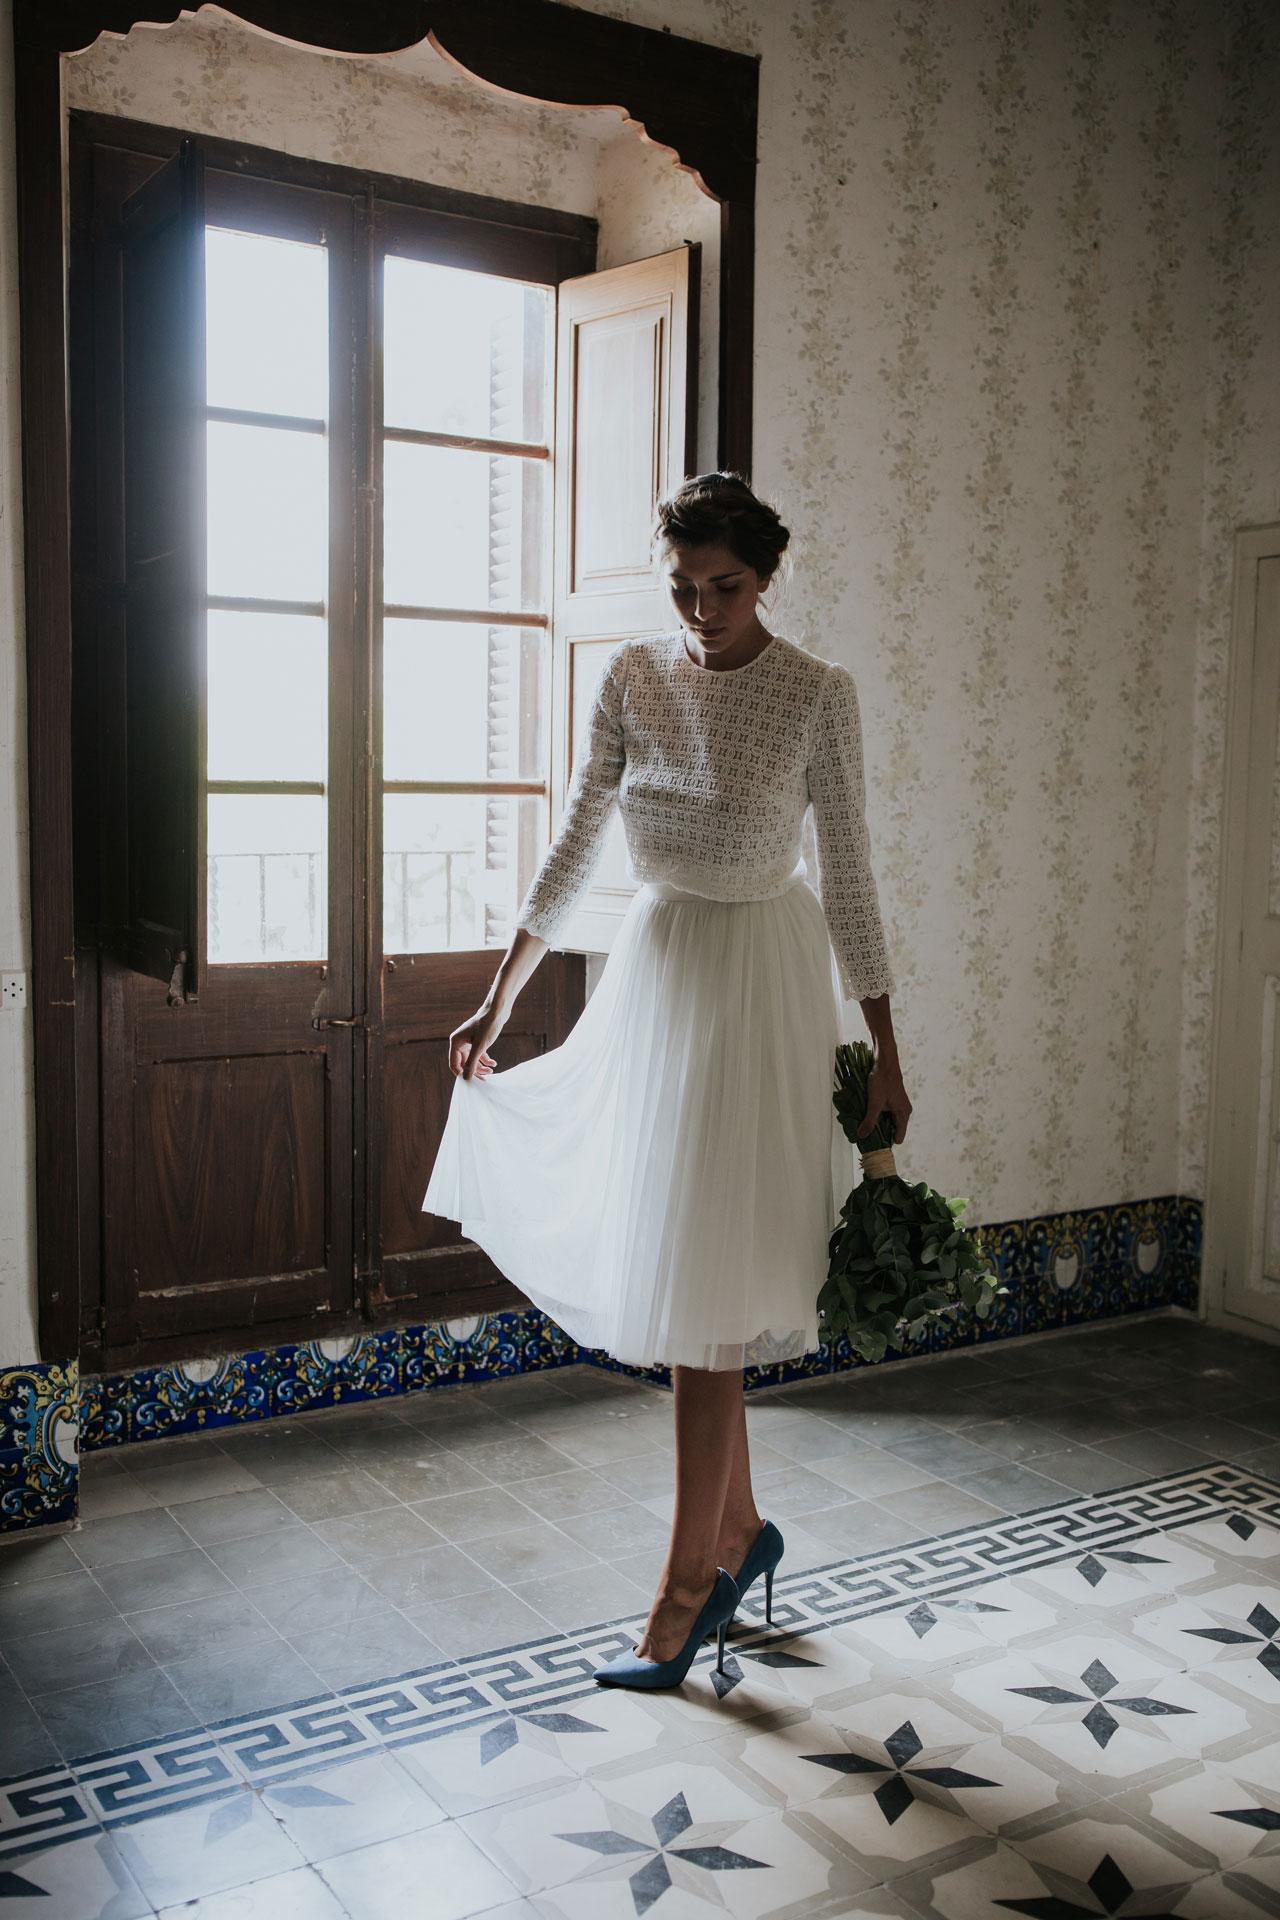 Vestido de novia Margarita-Marilyn / L'AVETIS